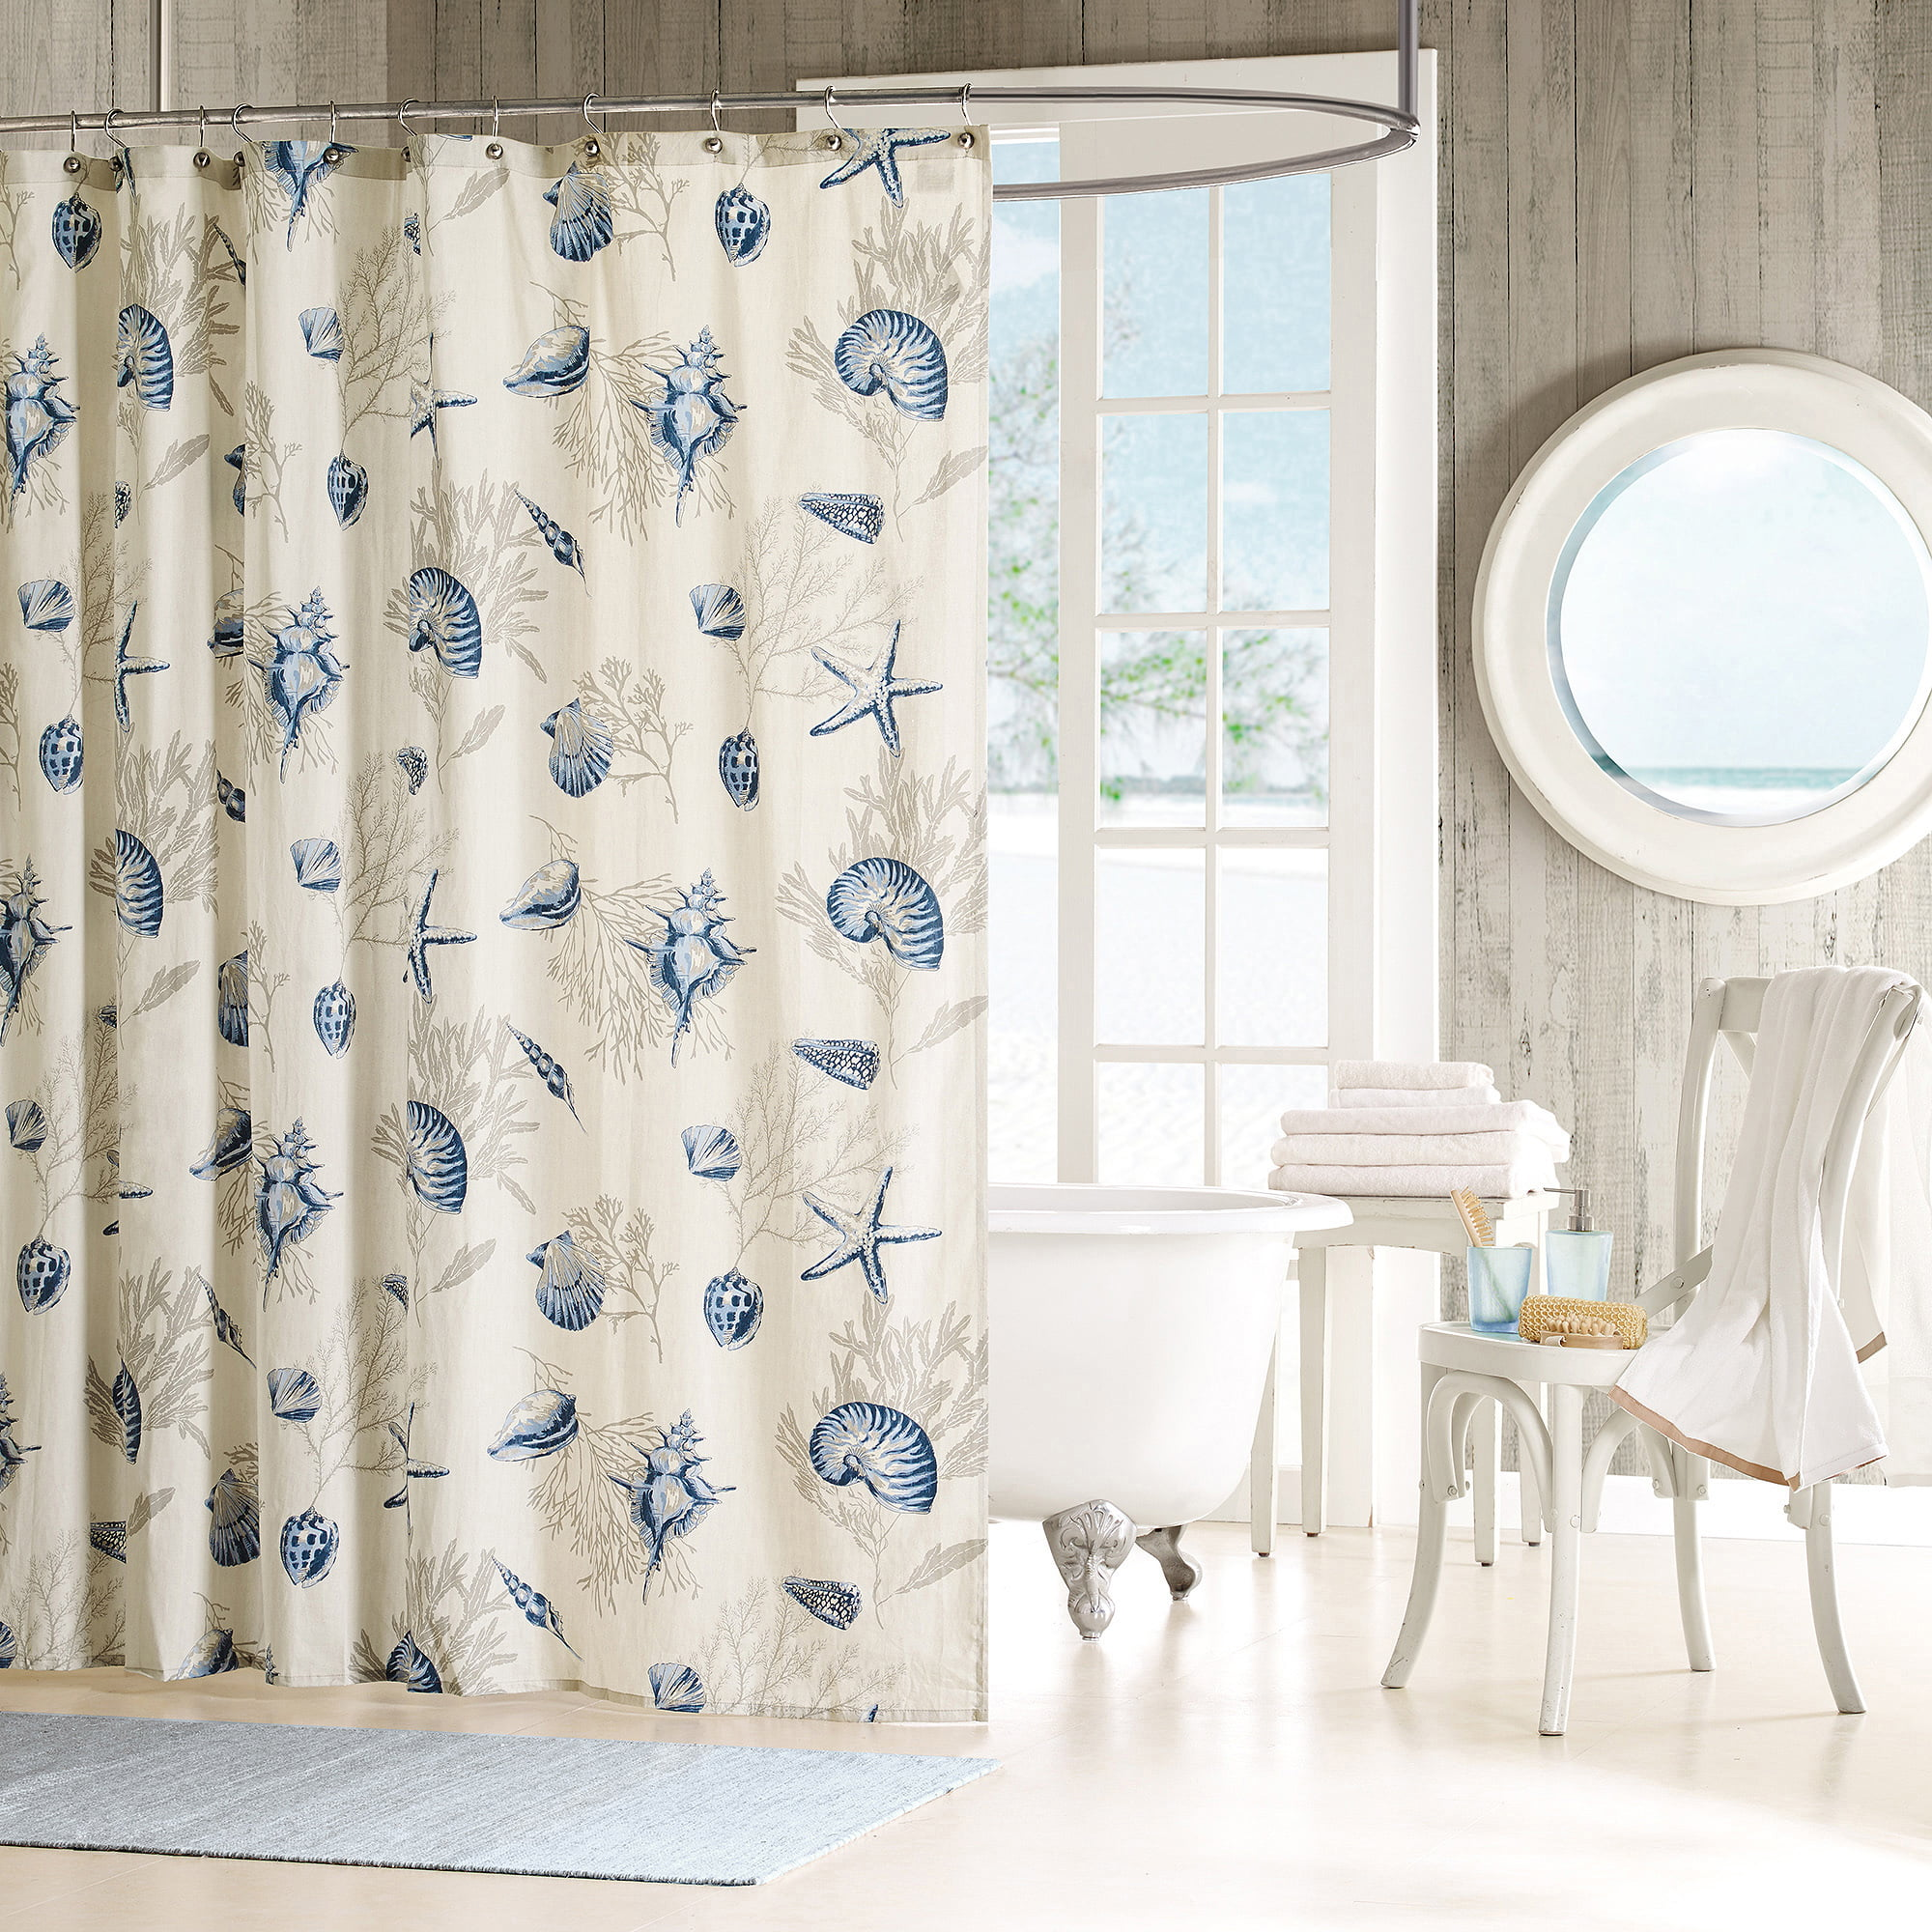 Home Essence Rockaway Cotton Shower Curtain by E&E Co. Ltd